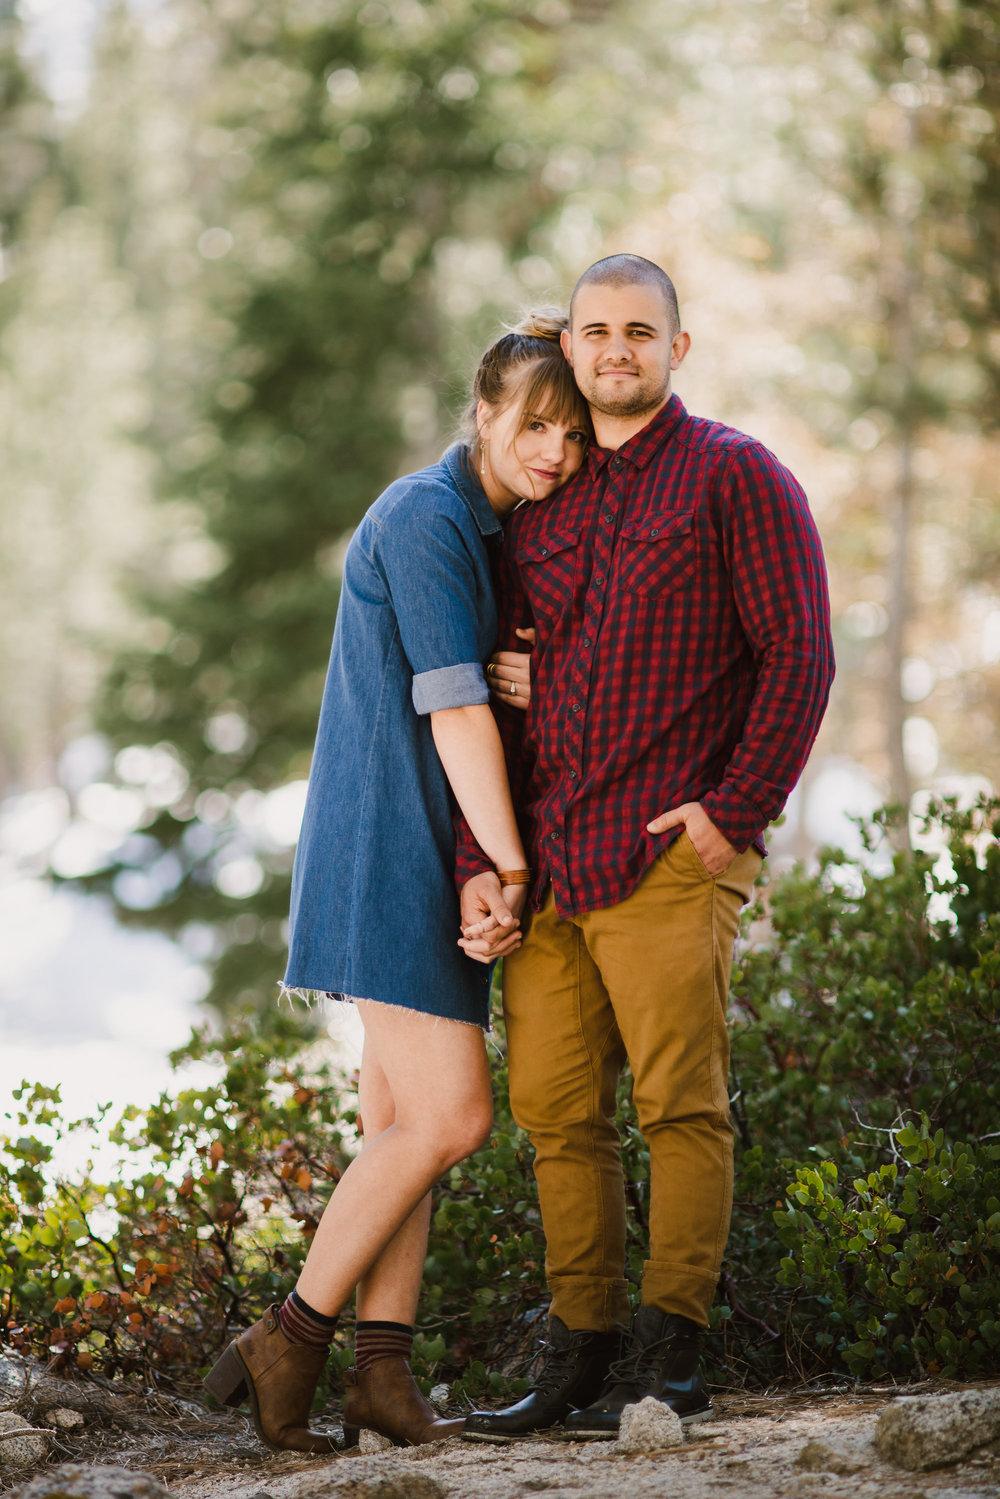 Isaiah&TaylorPhotography-Jared&KelseyEngagement-WEB-100.jpg